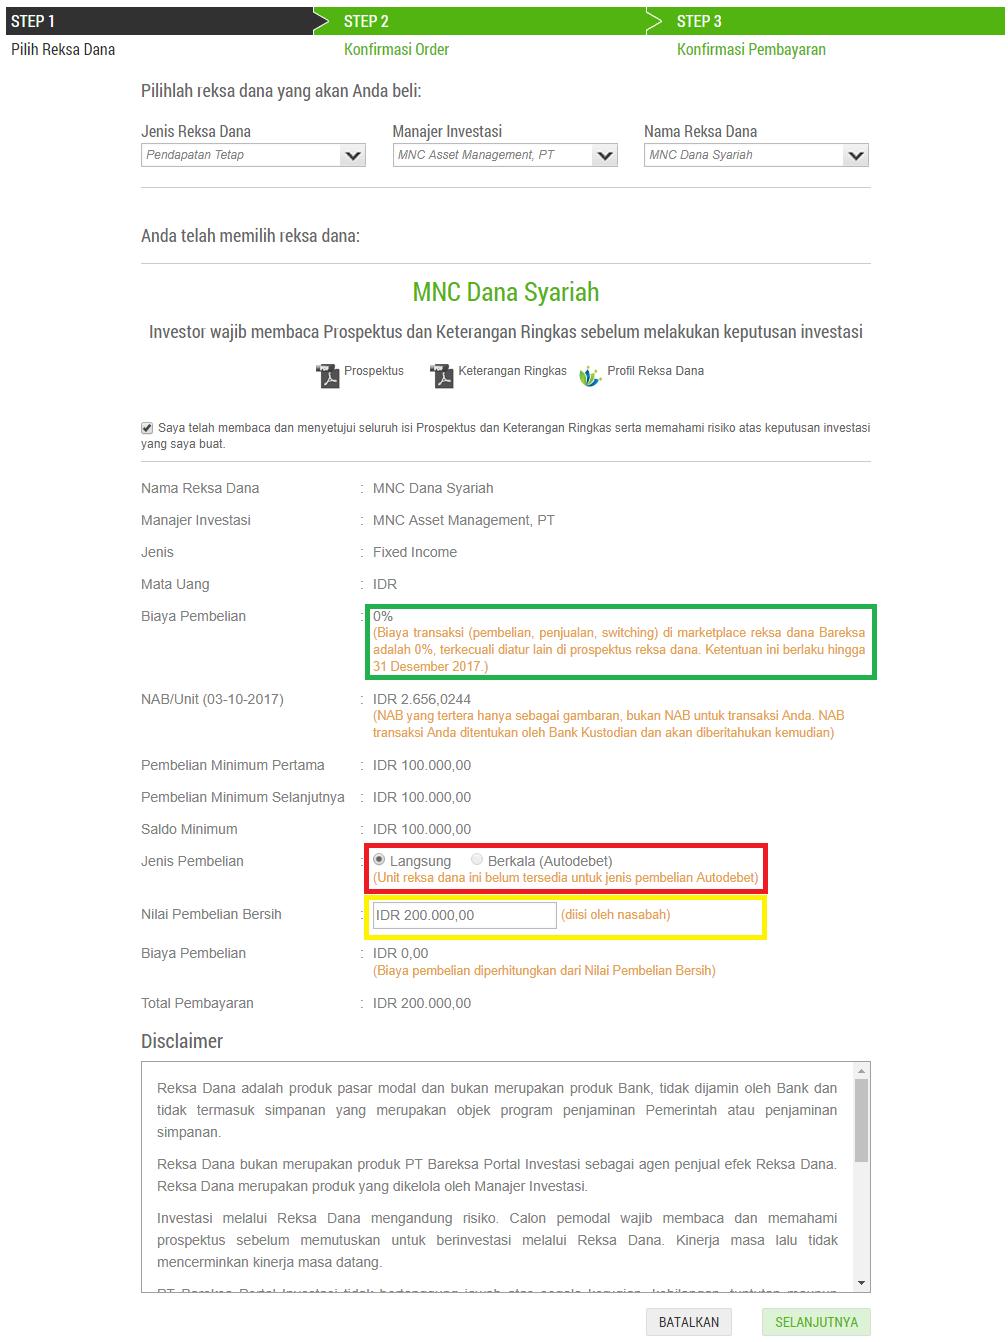 Cara Membeli Reksa Dana Di Bareksa Melalui Website Dan Aplikasi (Update 25/4/18) 2